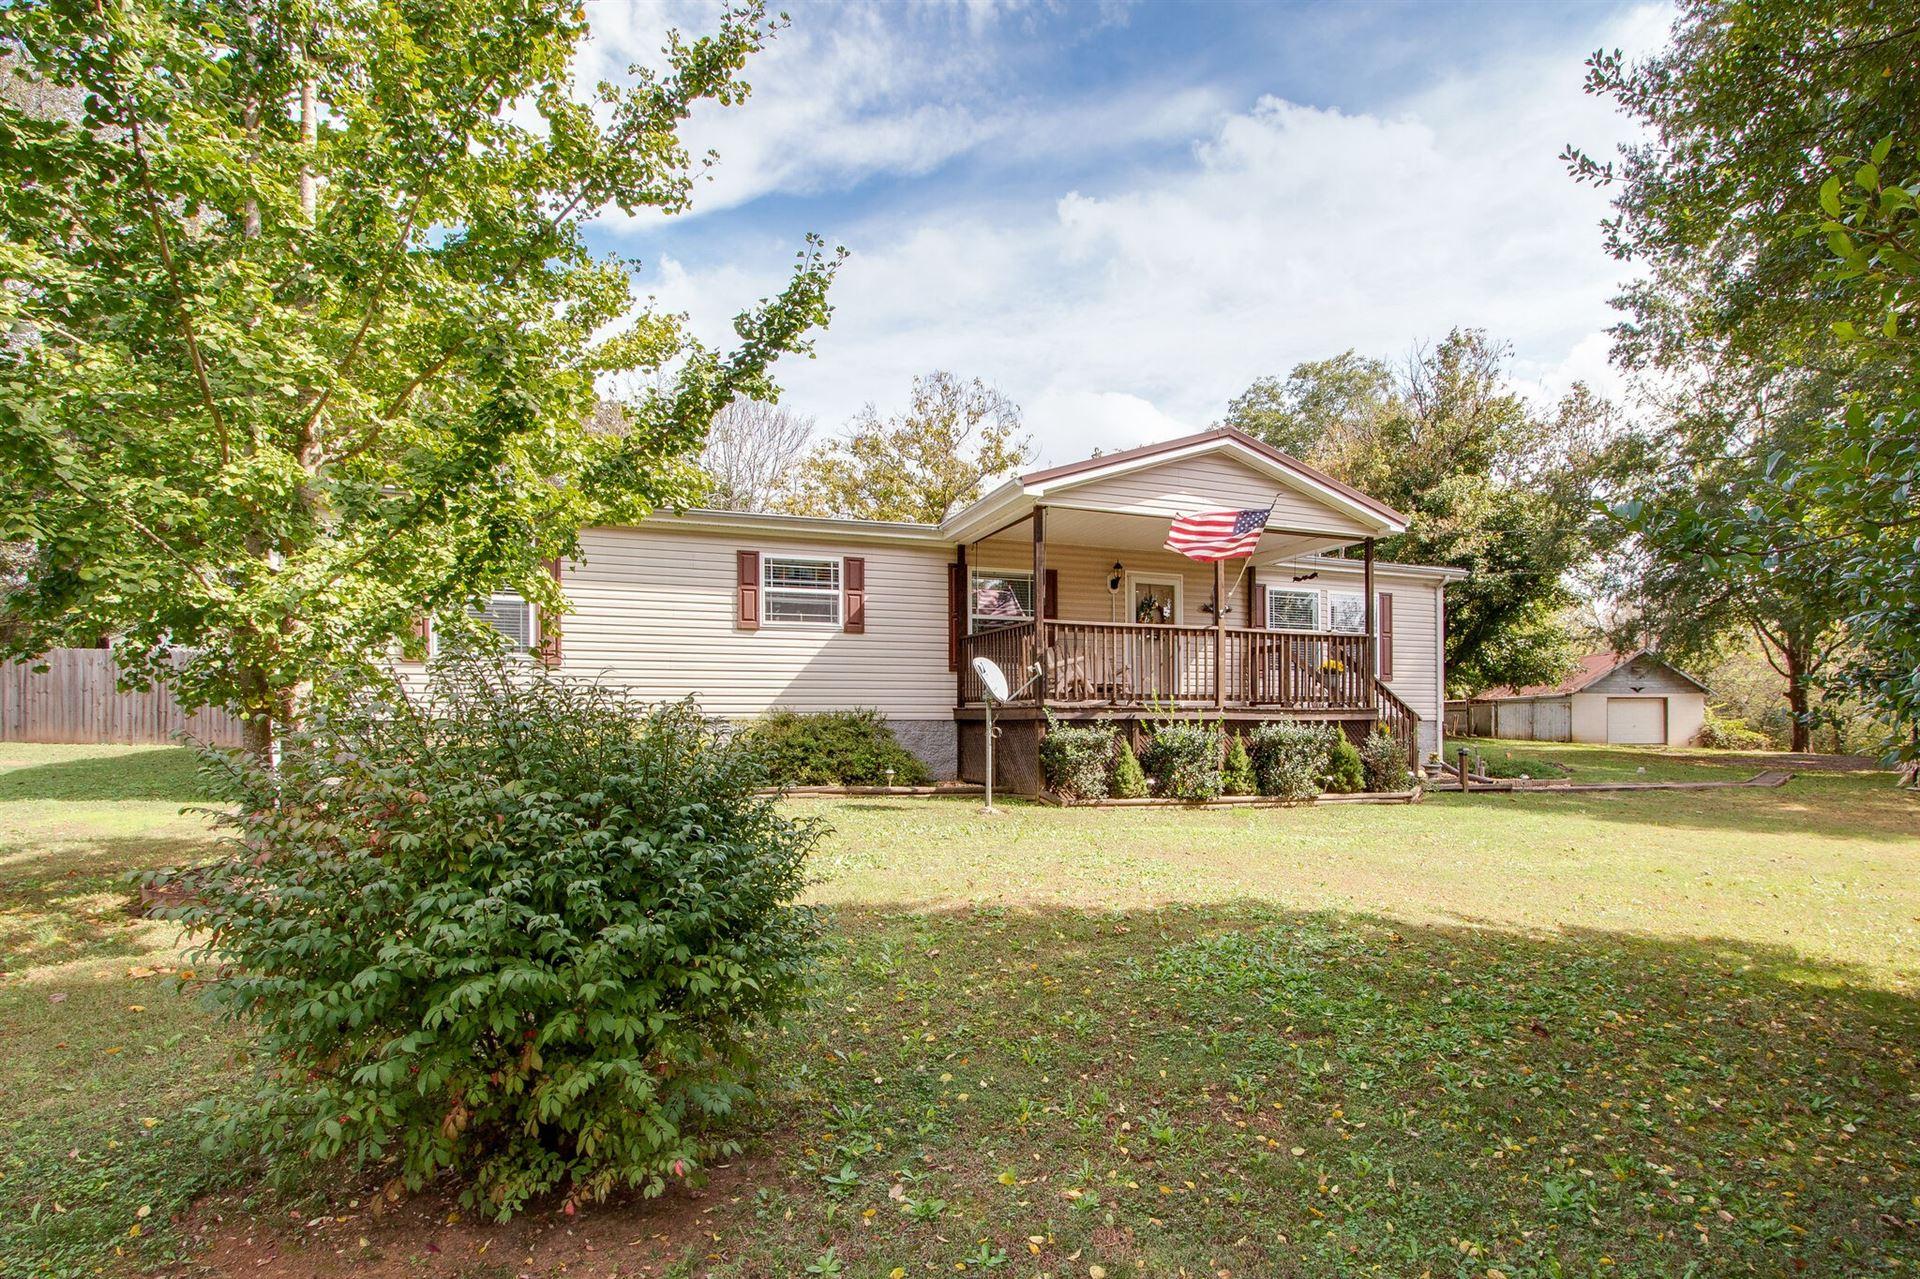 1122 John Sharp Rd, Columbia, TN 38401 - MLS#: 2300565